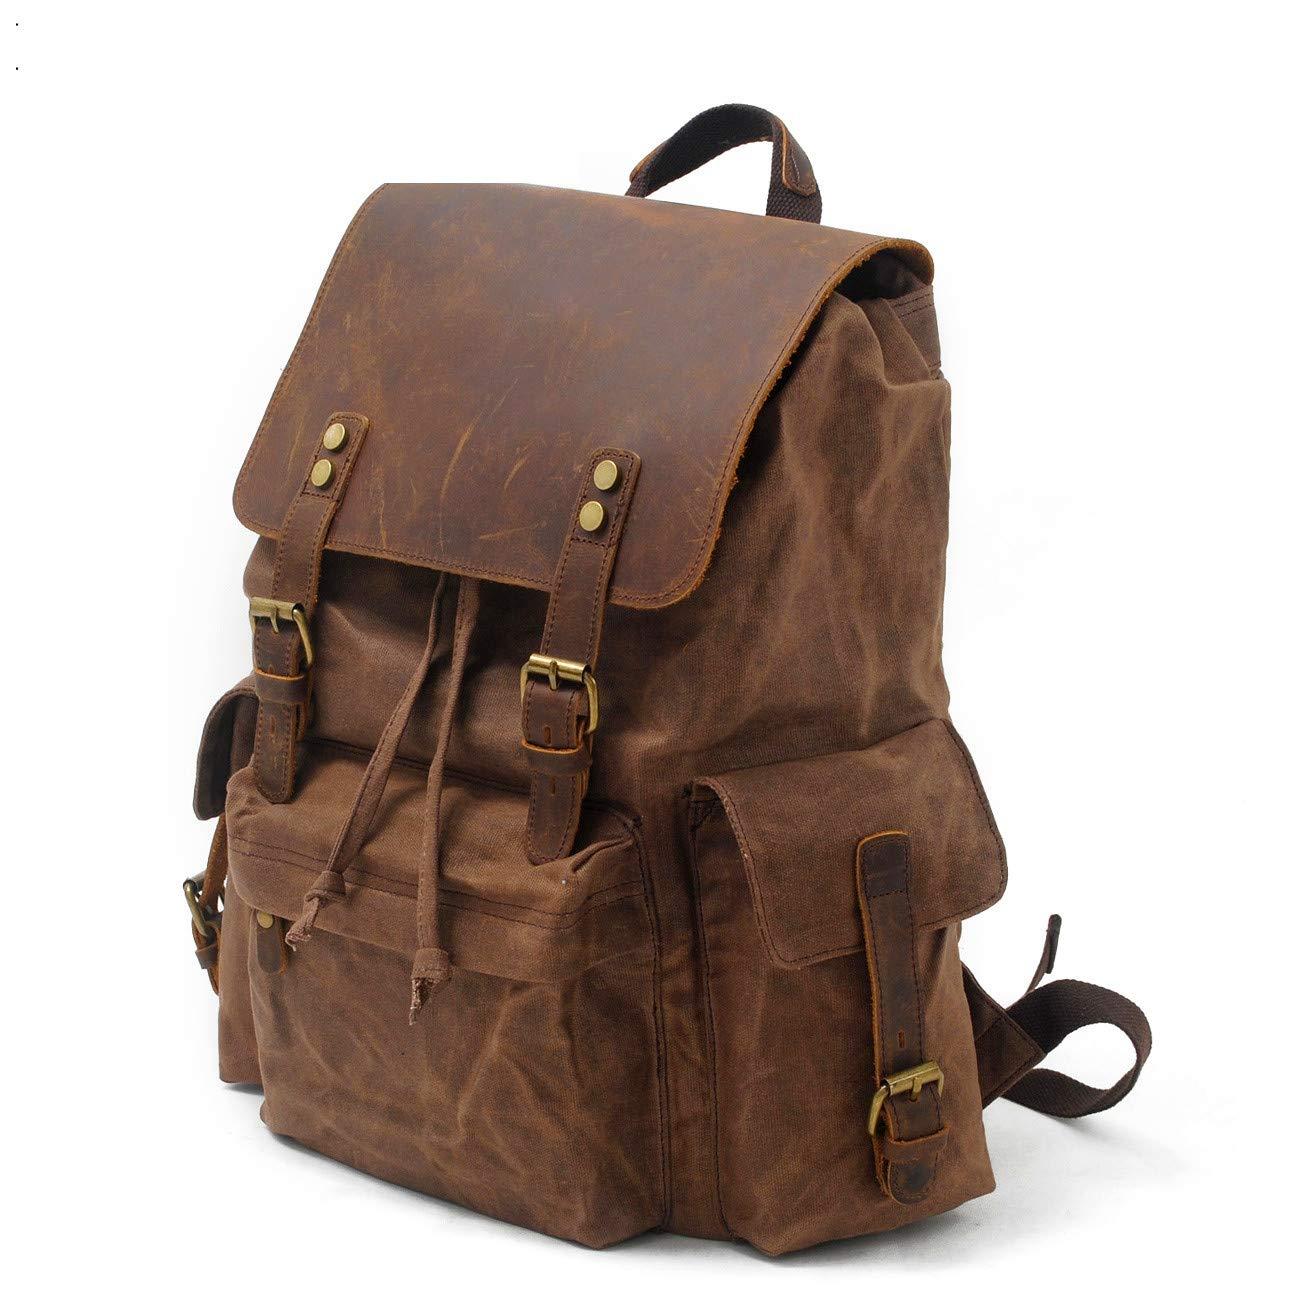 17e3862c11e9 SVANZE Vintage Canvas Leather Laptop Backpack for Men School Bag 15.6